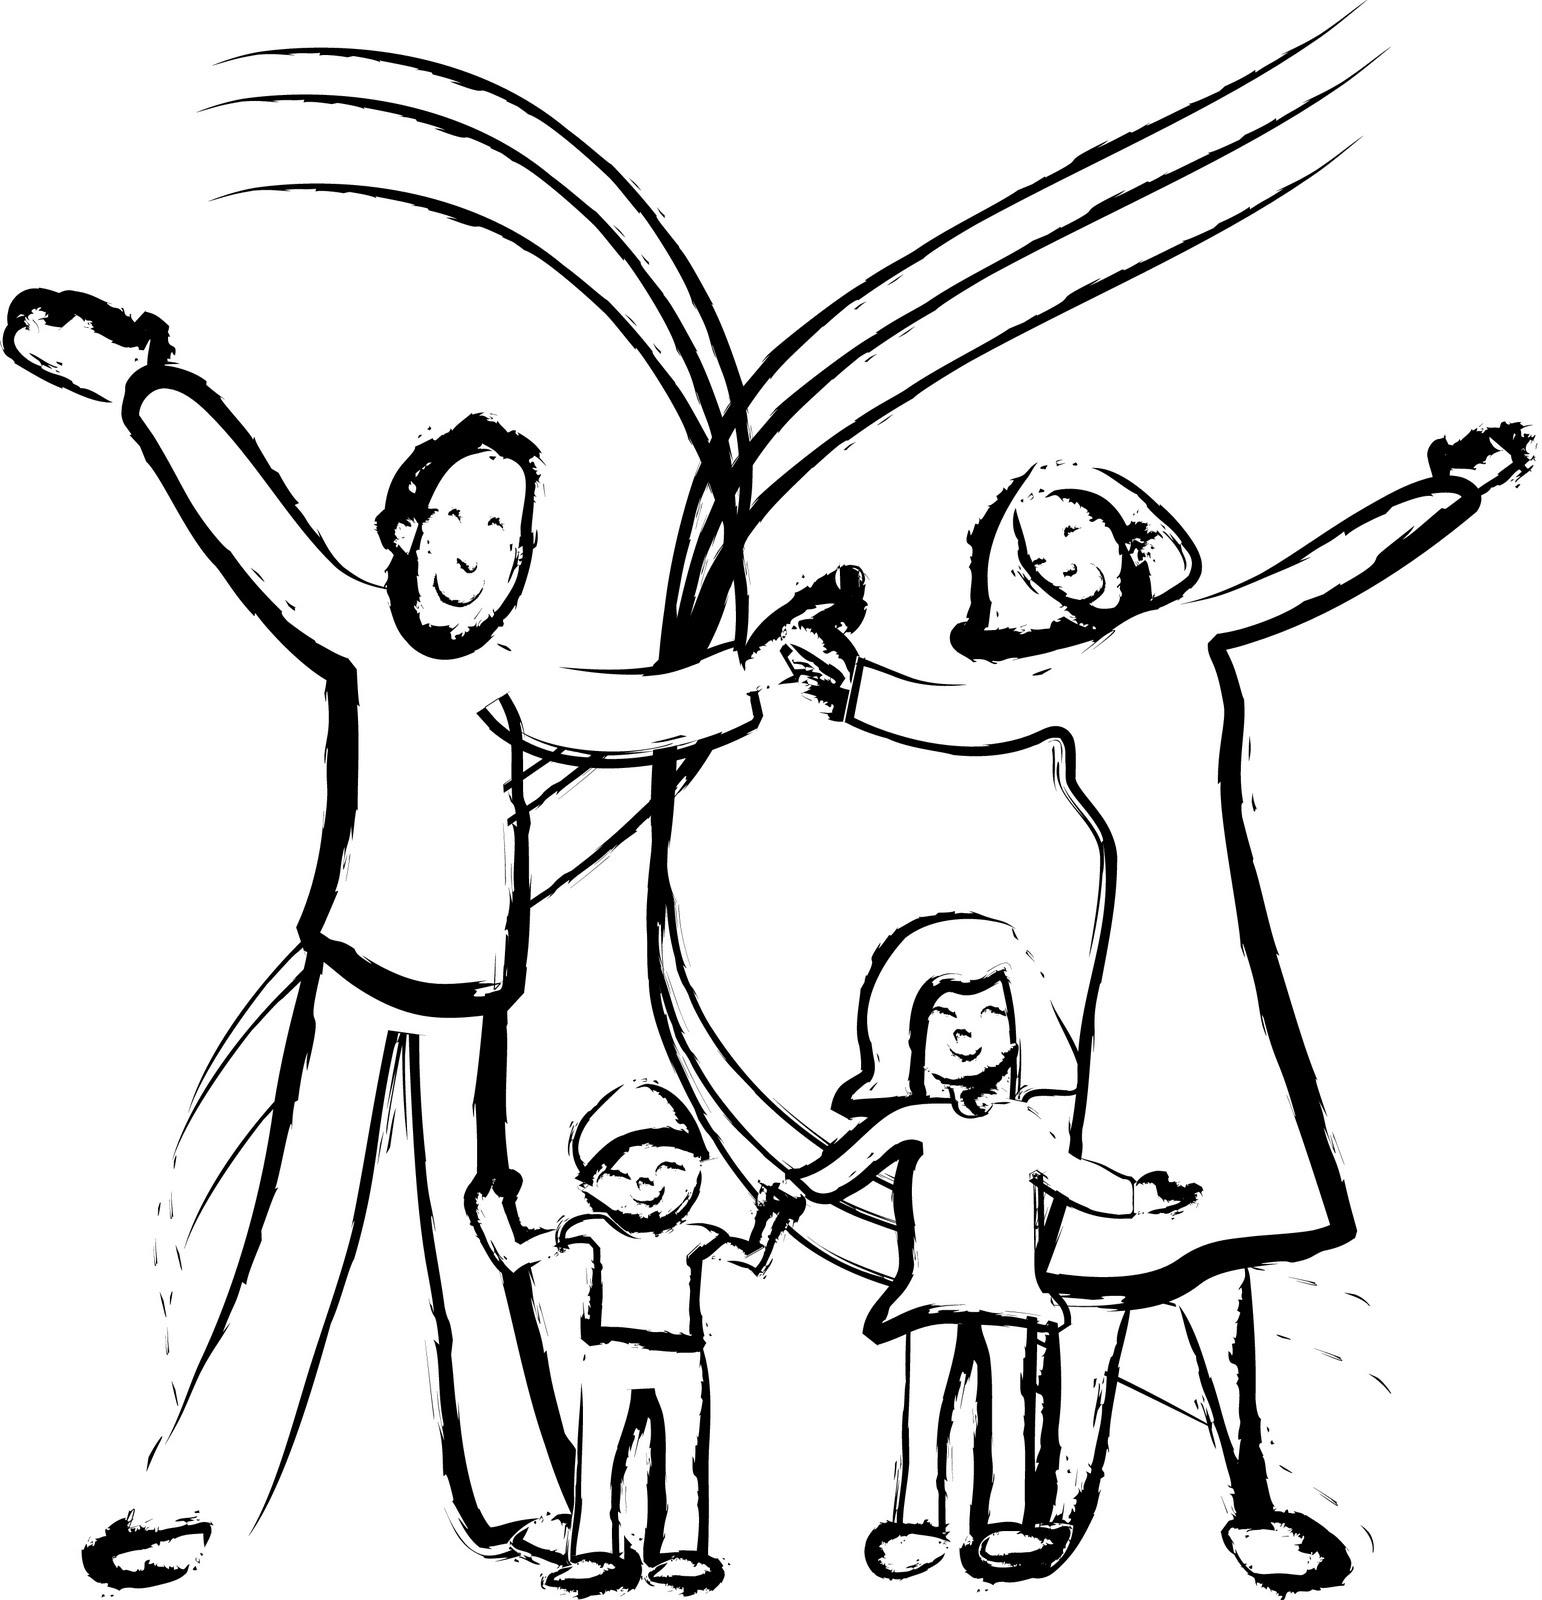 Feeding the Imagination: Family Community & Culture